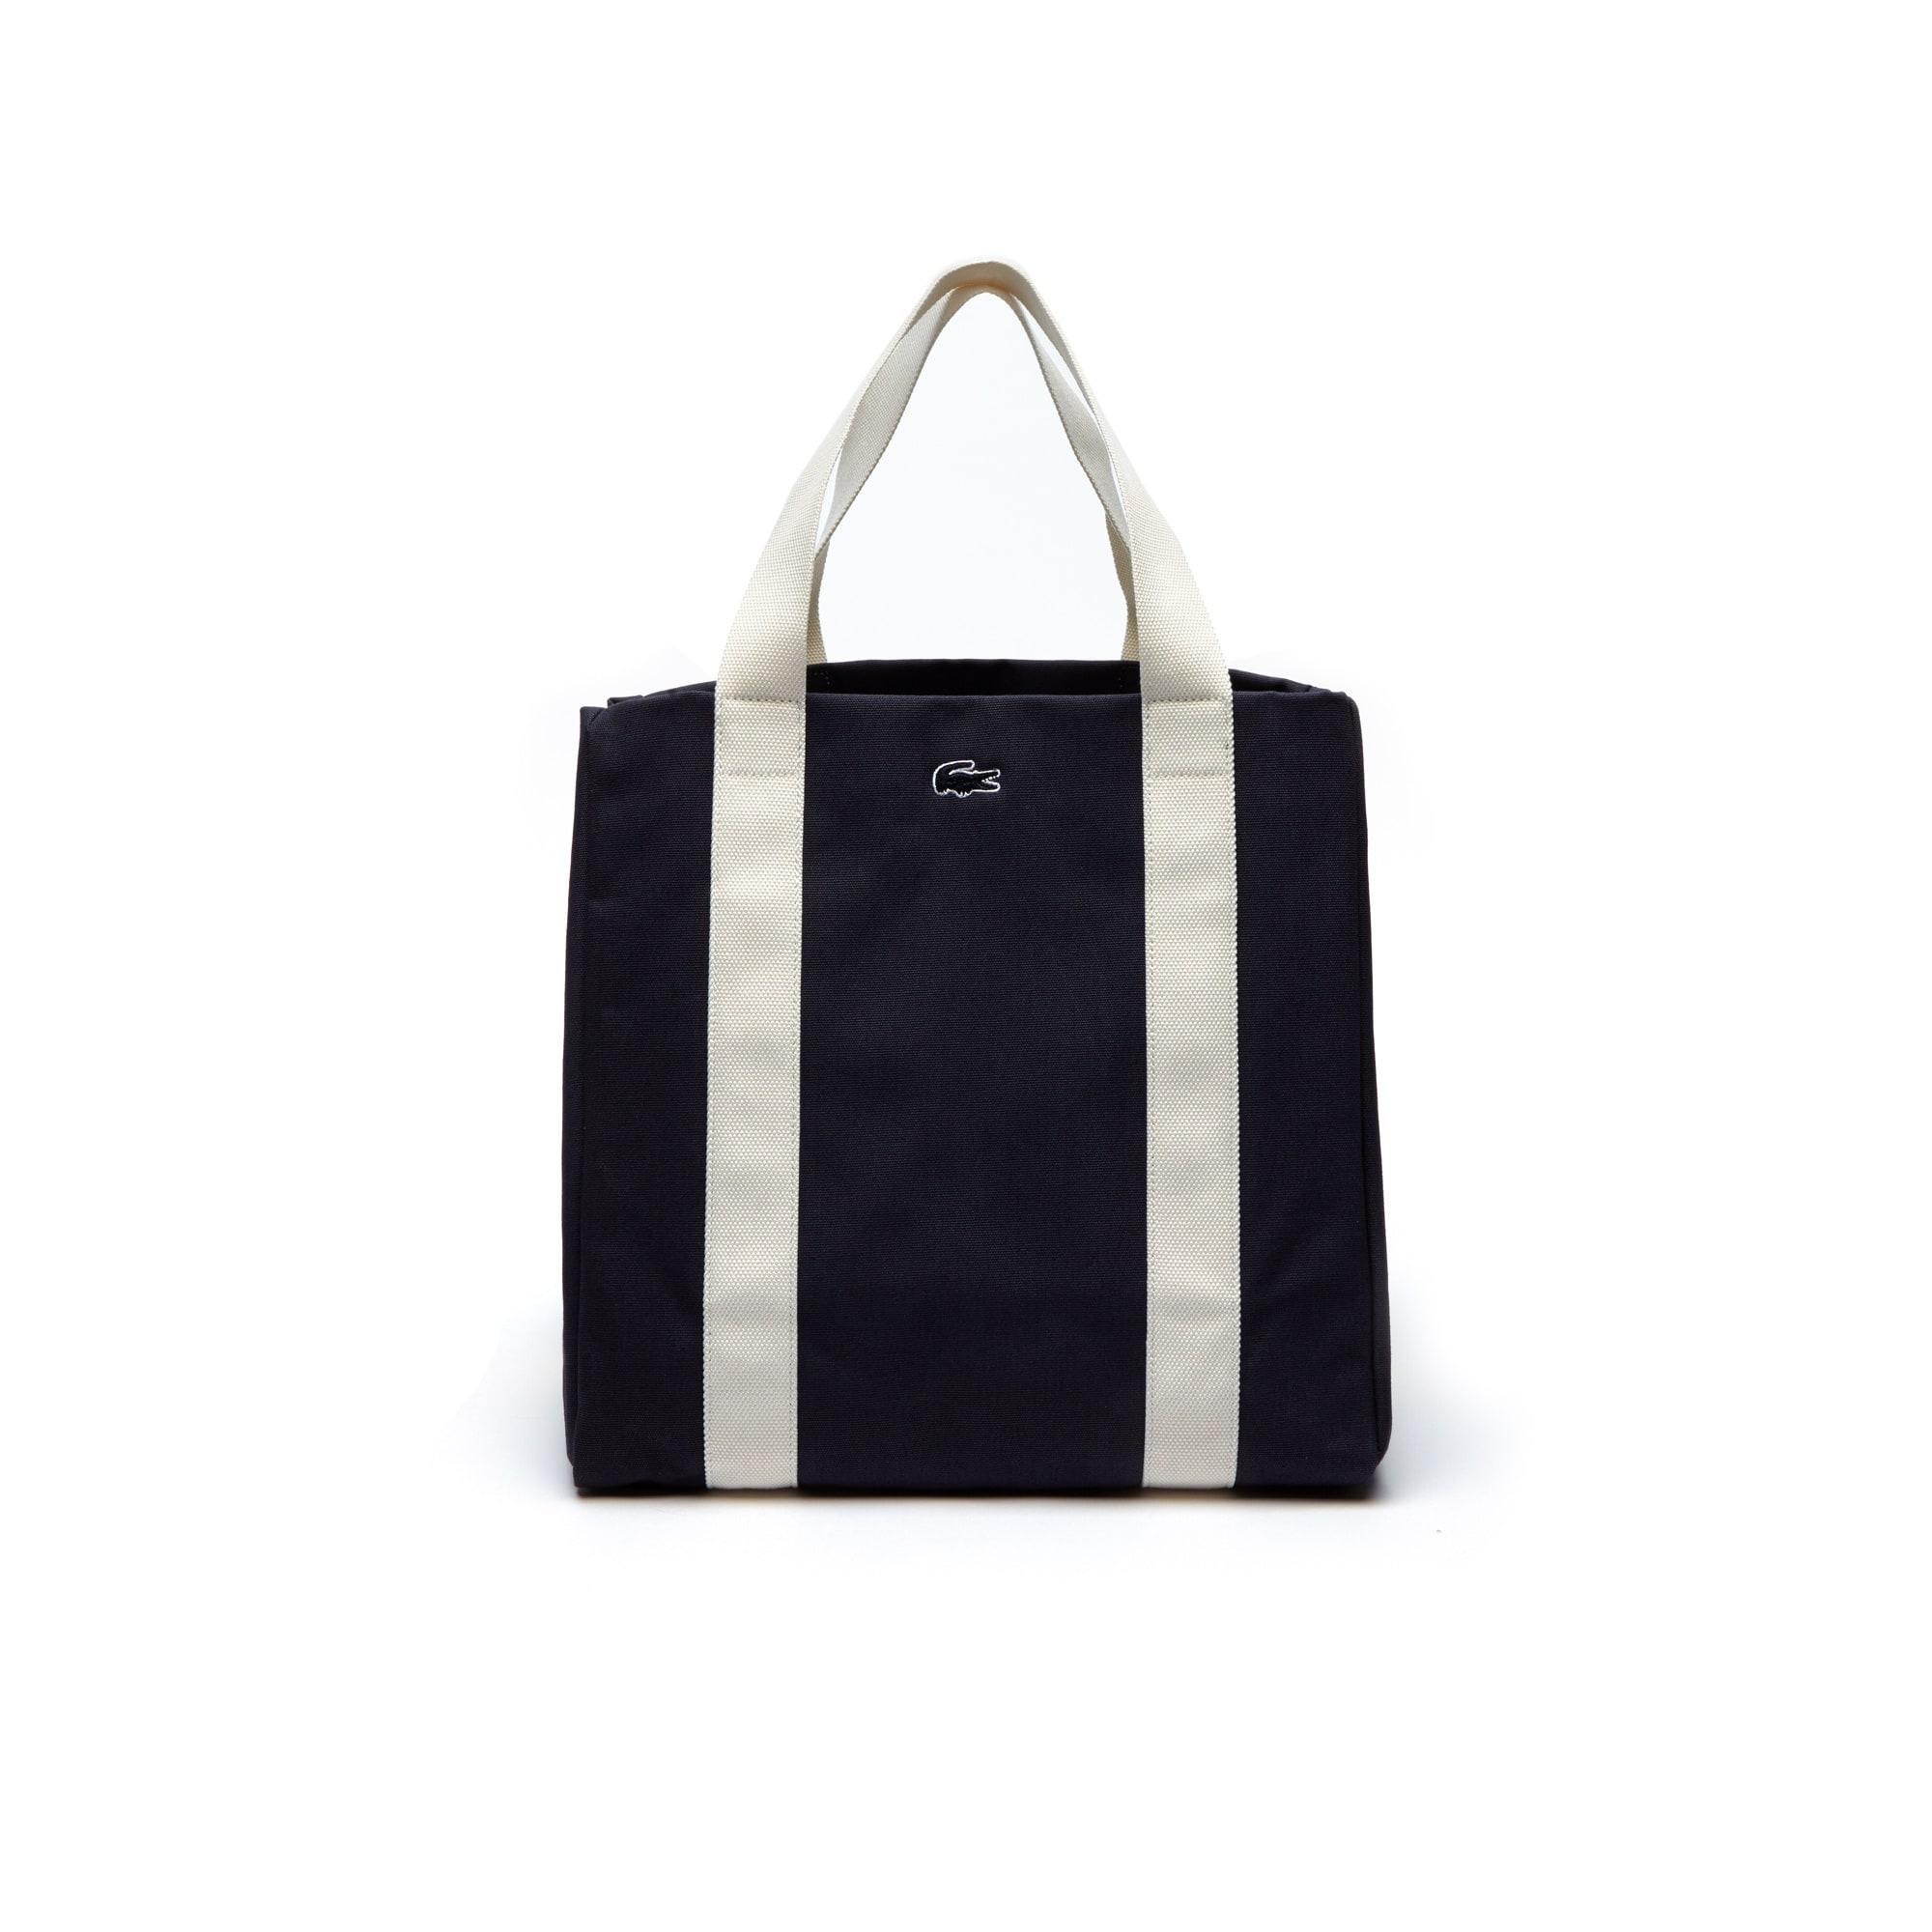 ffdcafd3e9 Women's Summer Colorblock Cotton Large Expandable Tote Bag ...